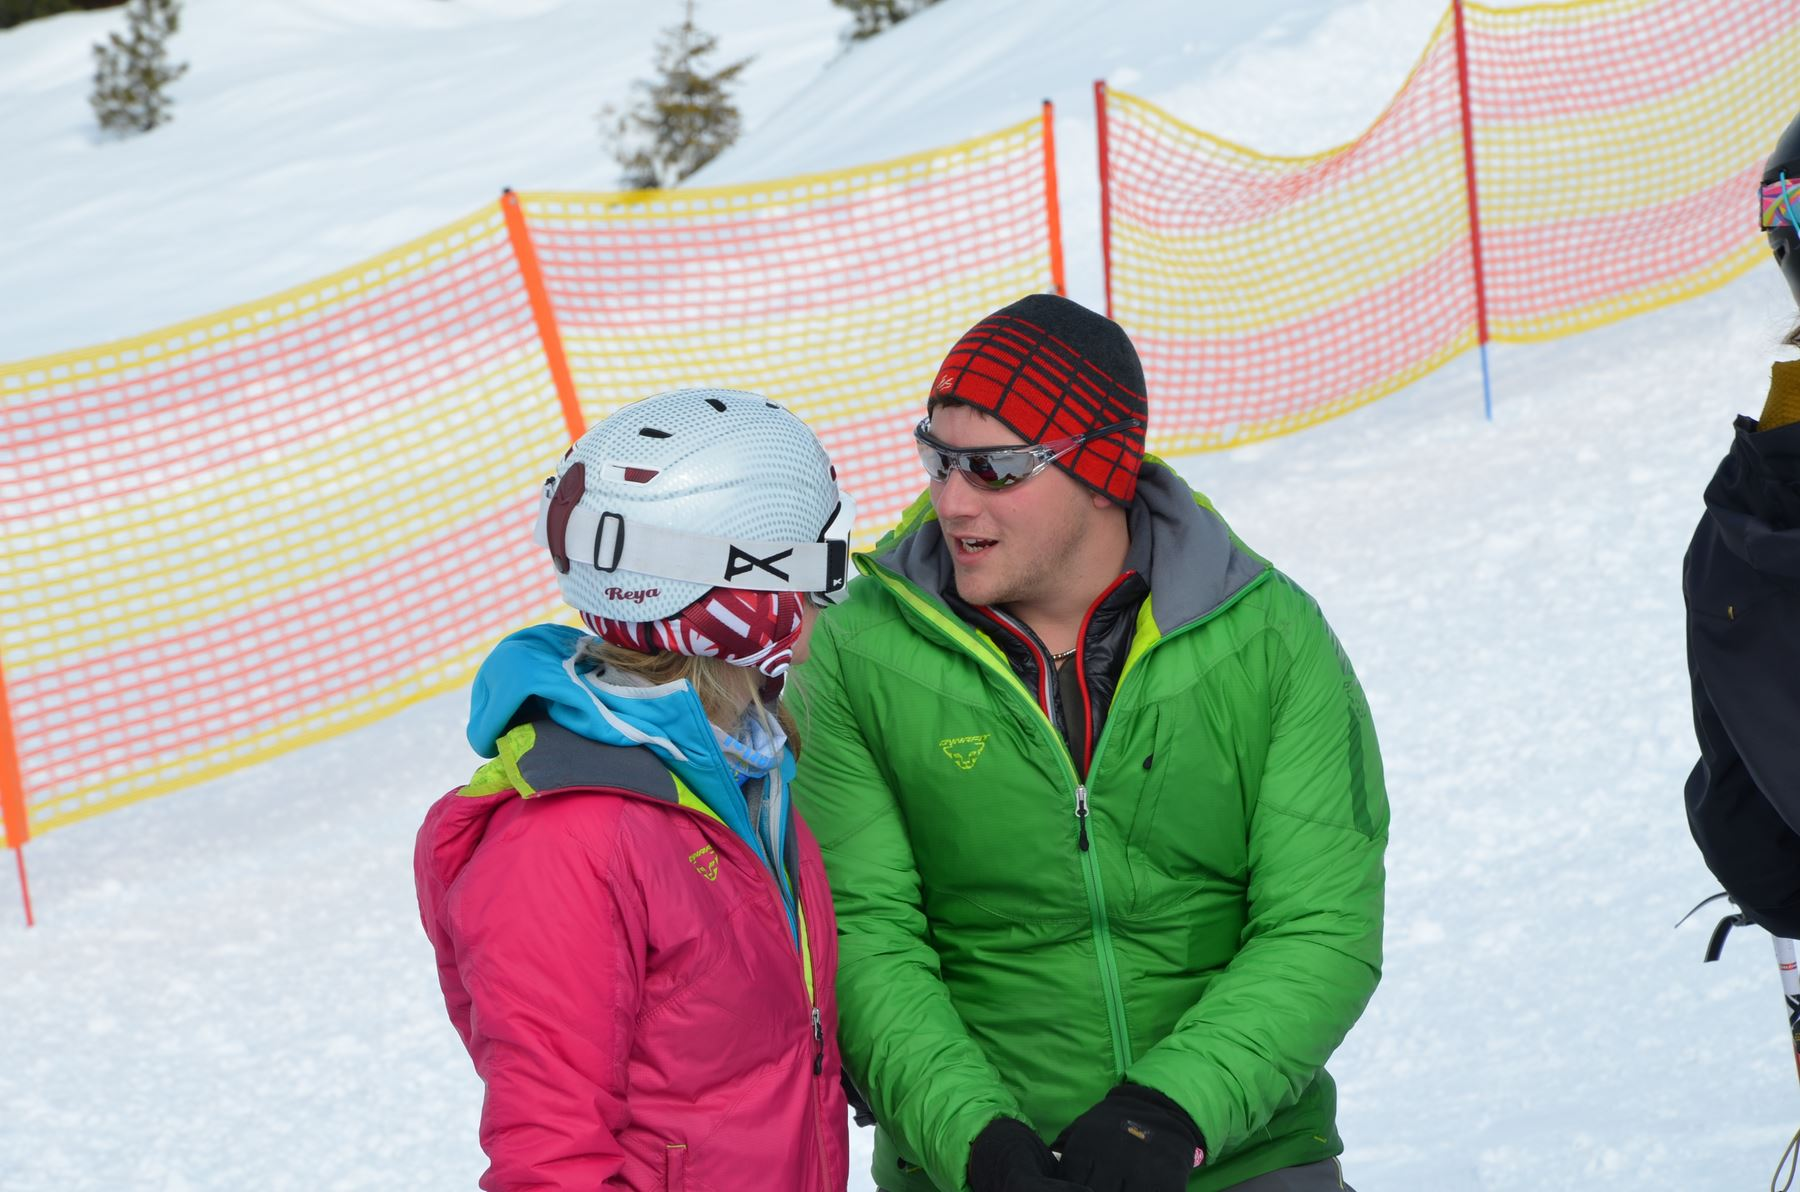 2015-03-22 BV Zillertal Skirennen 281.JPG